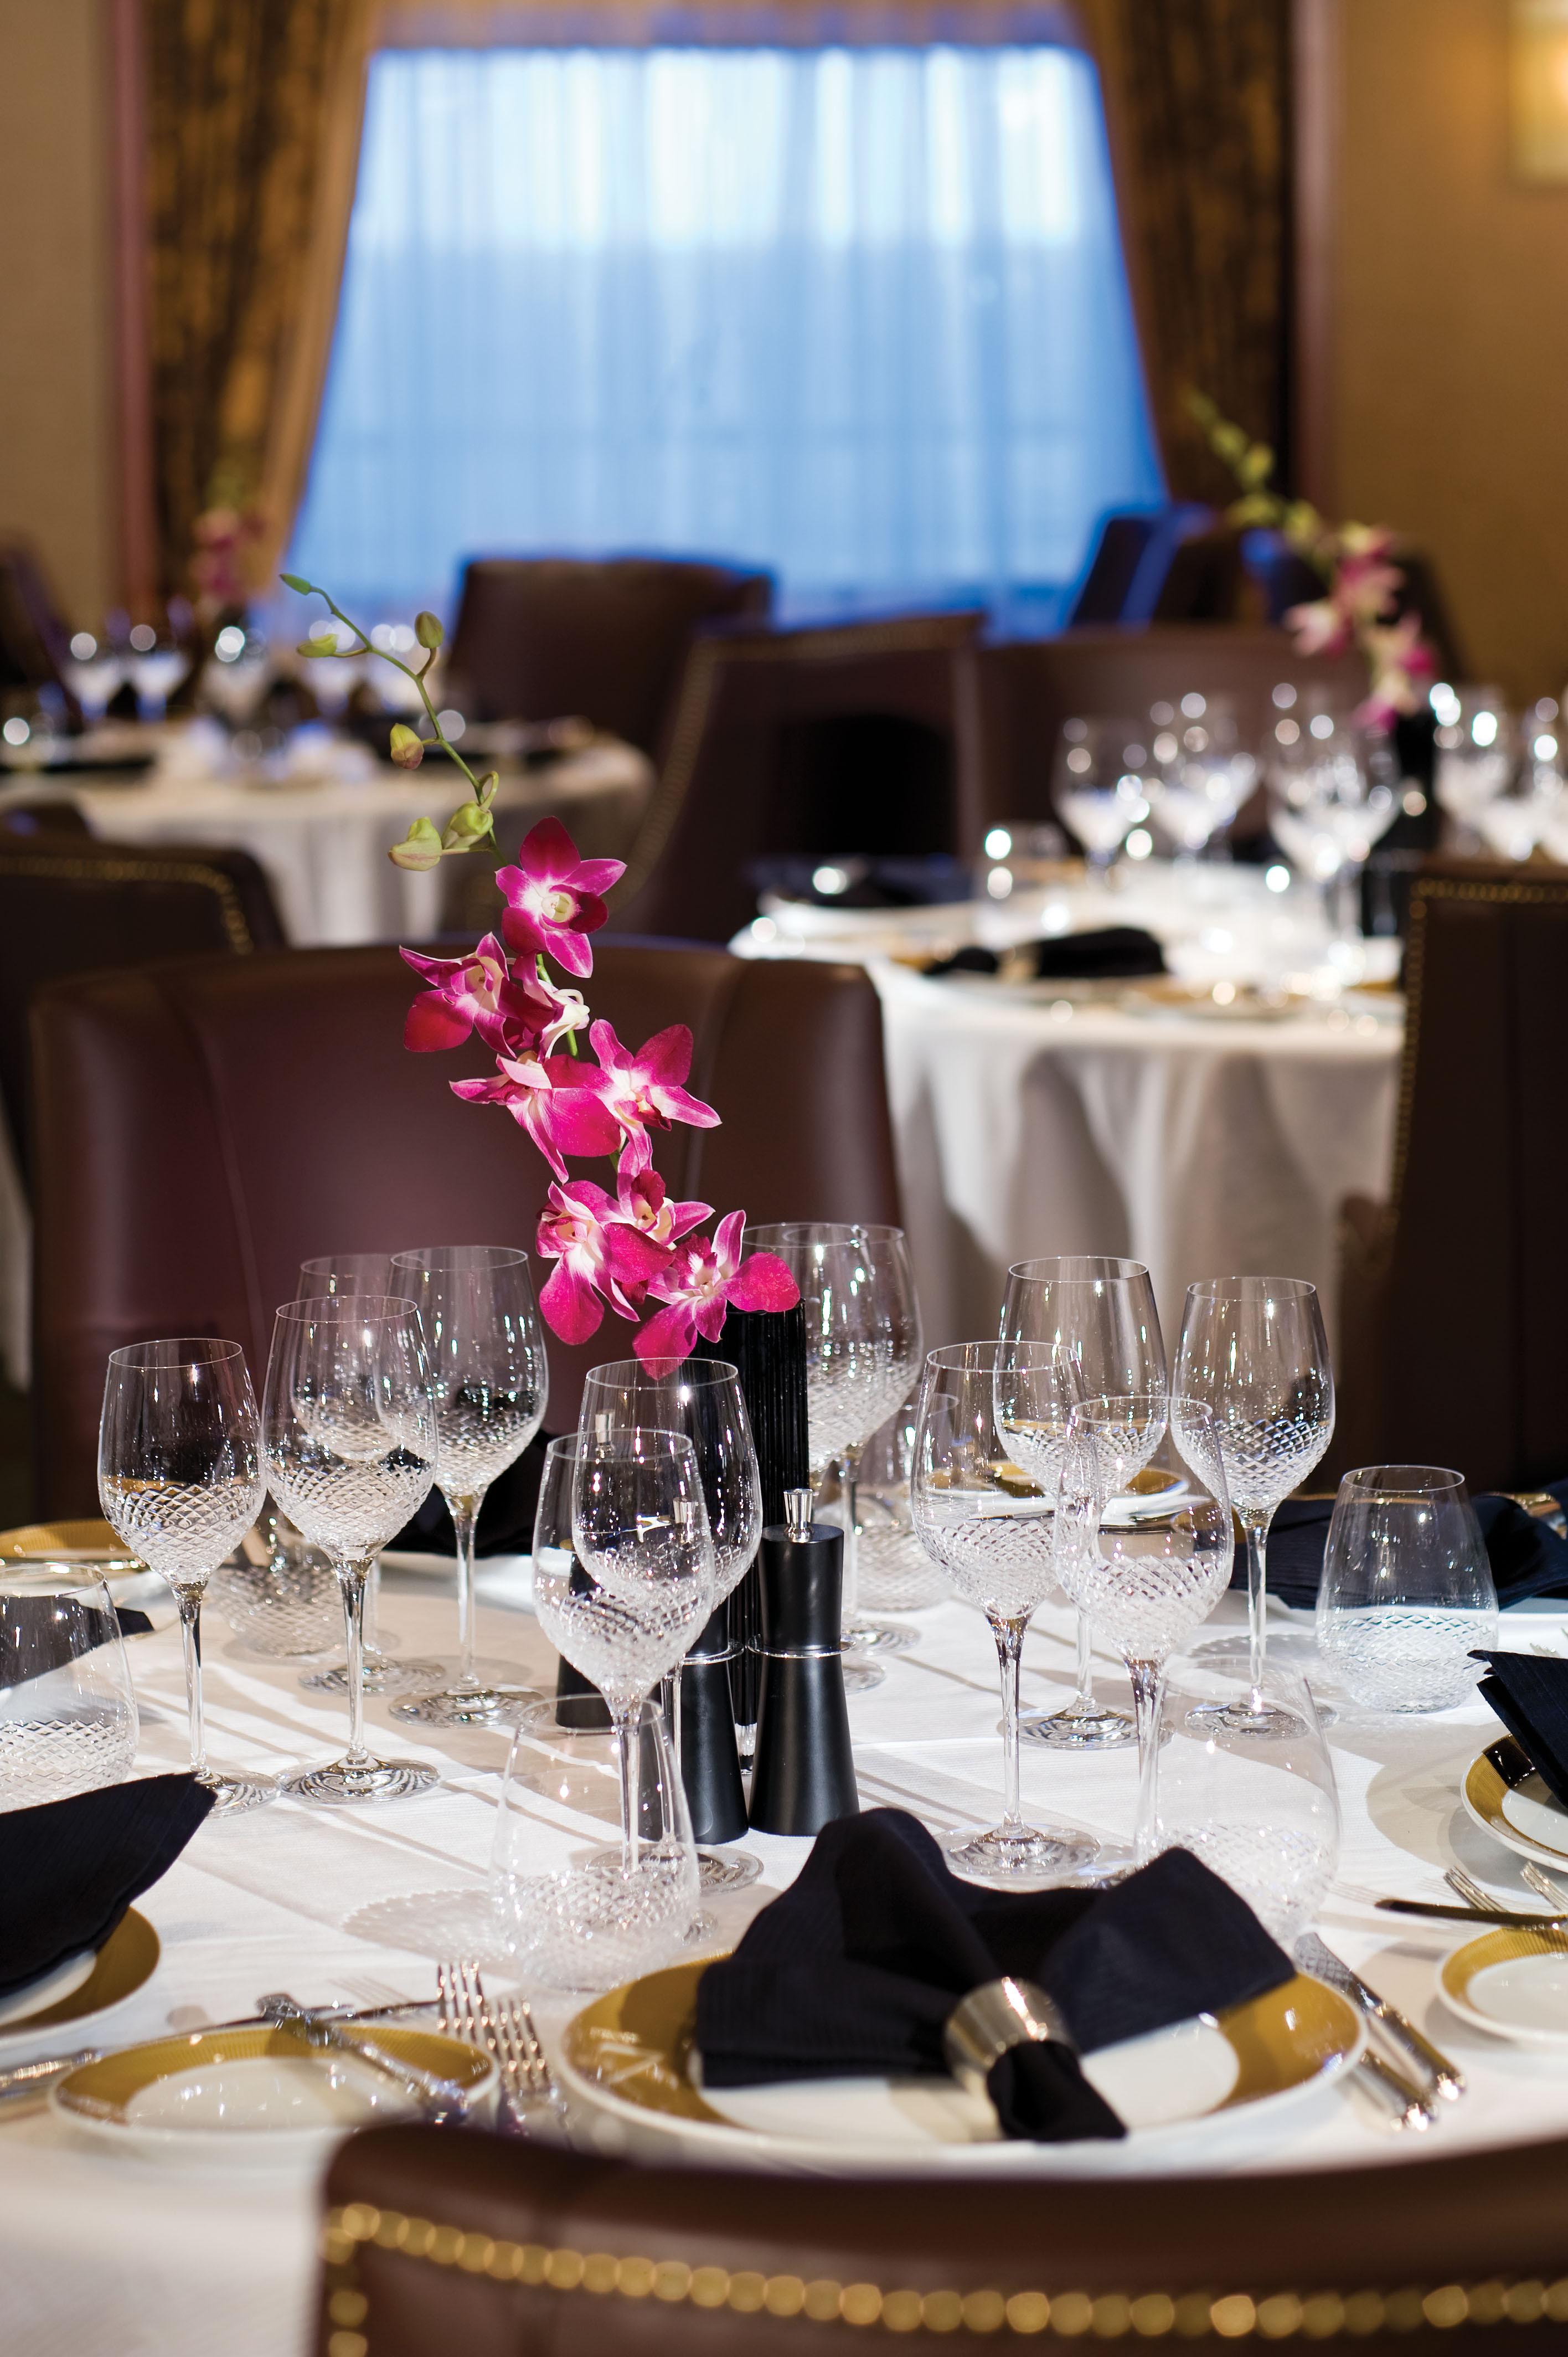 Seven Seas Voyager - Prime Seven Restaurant